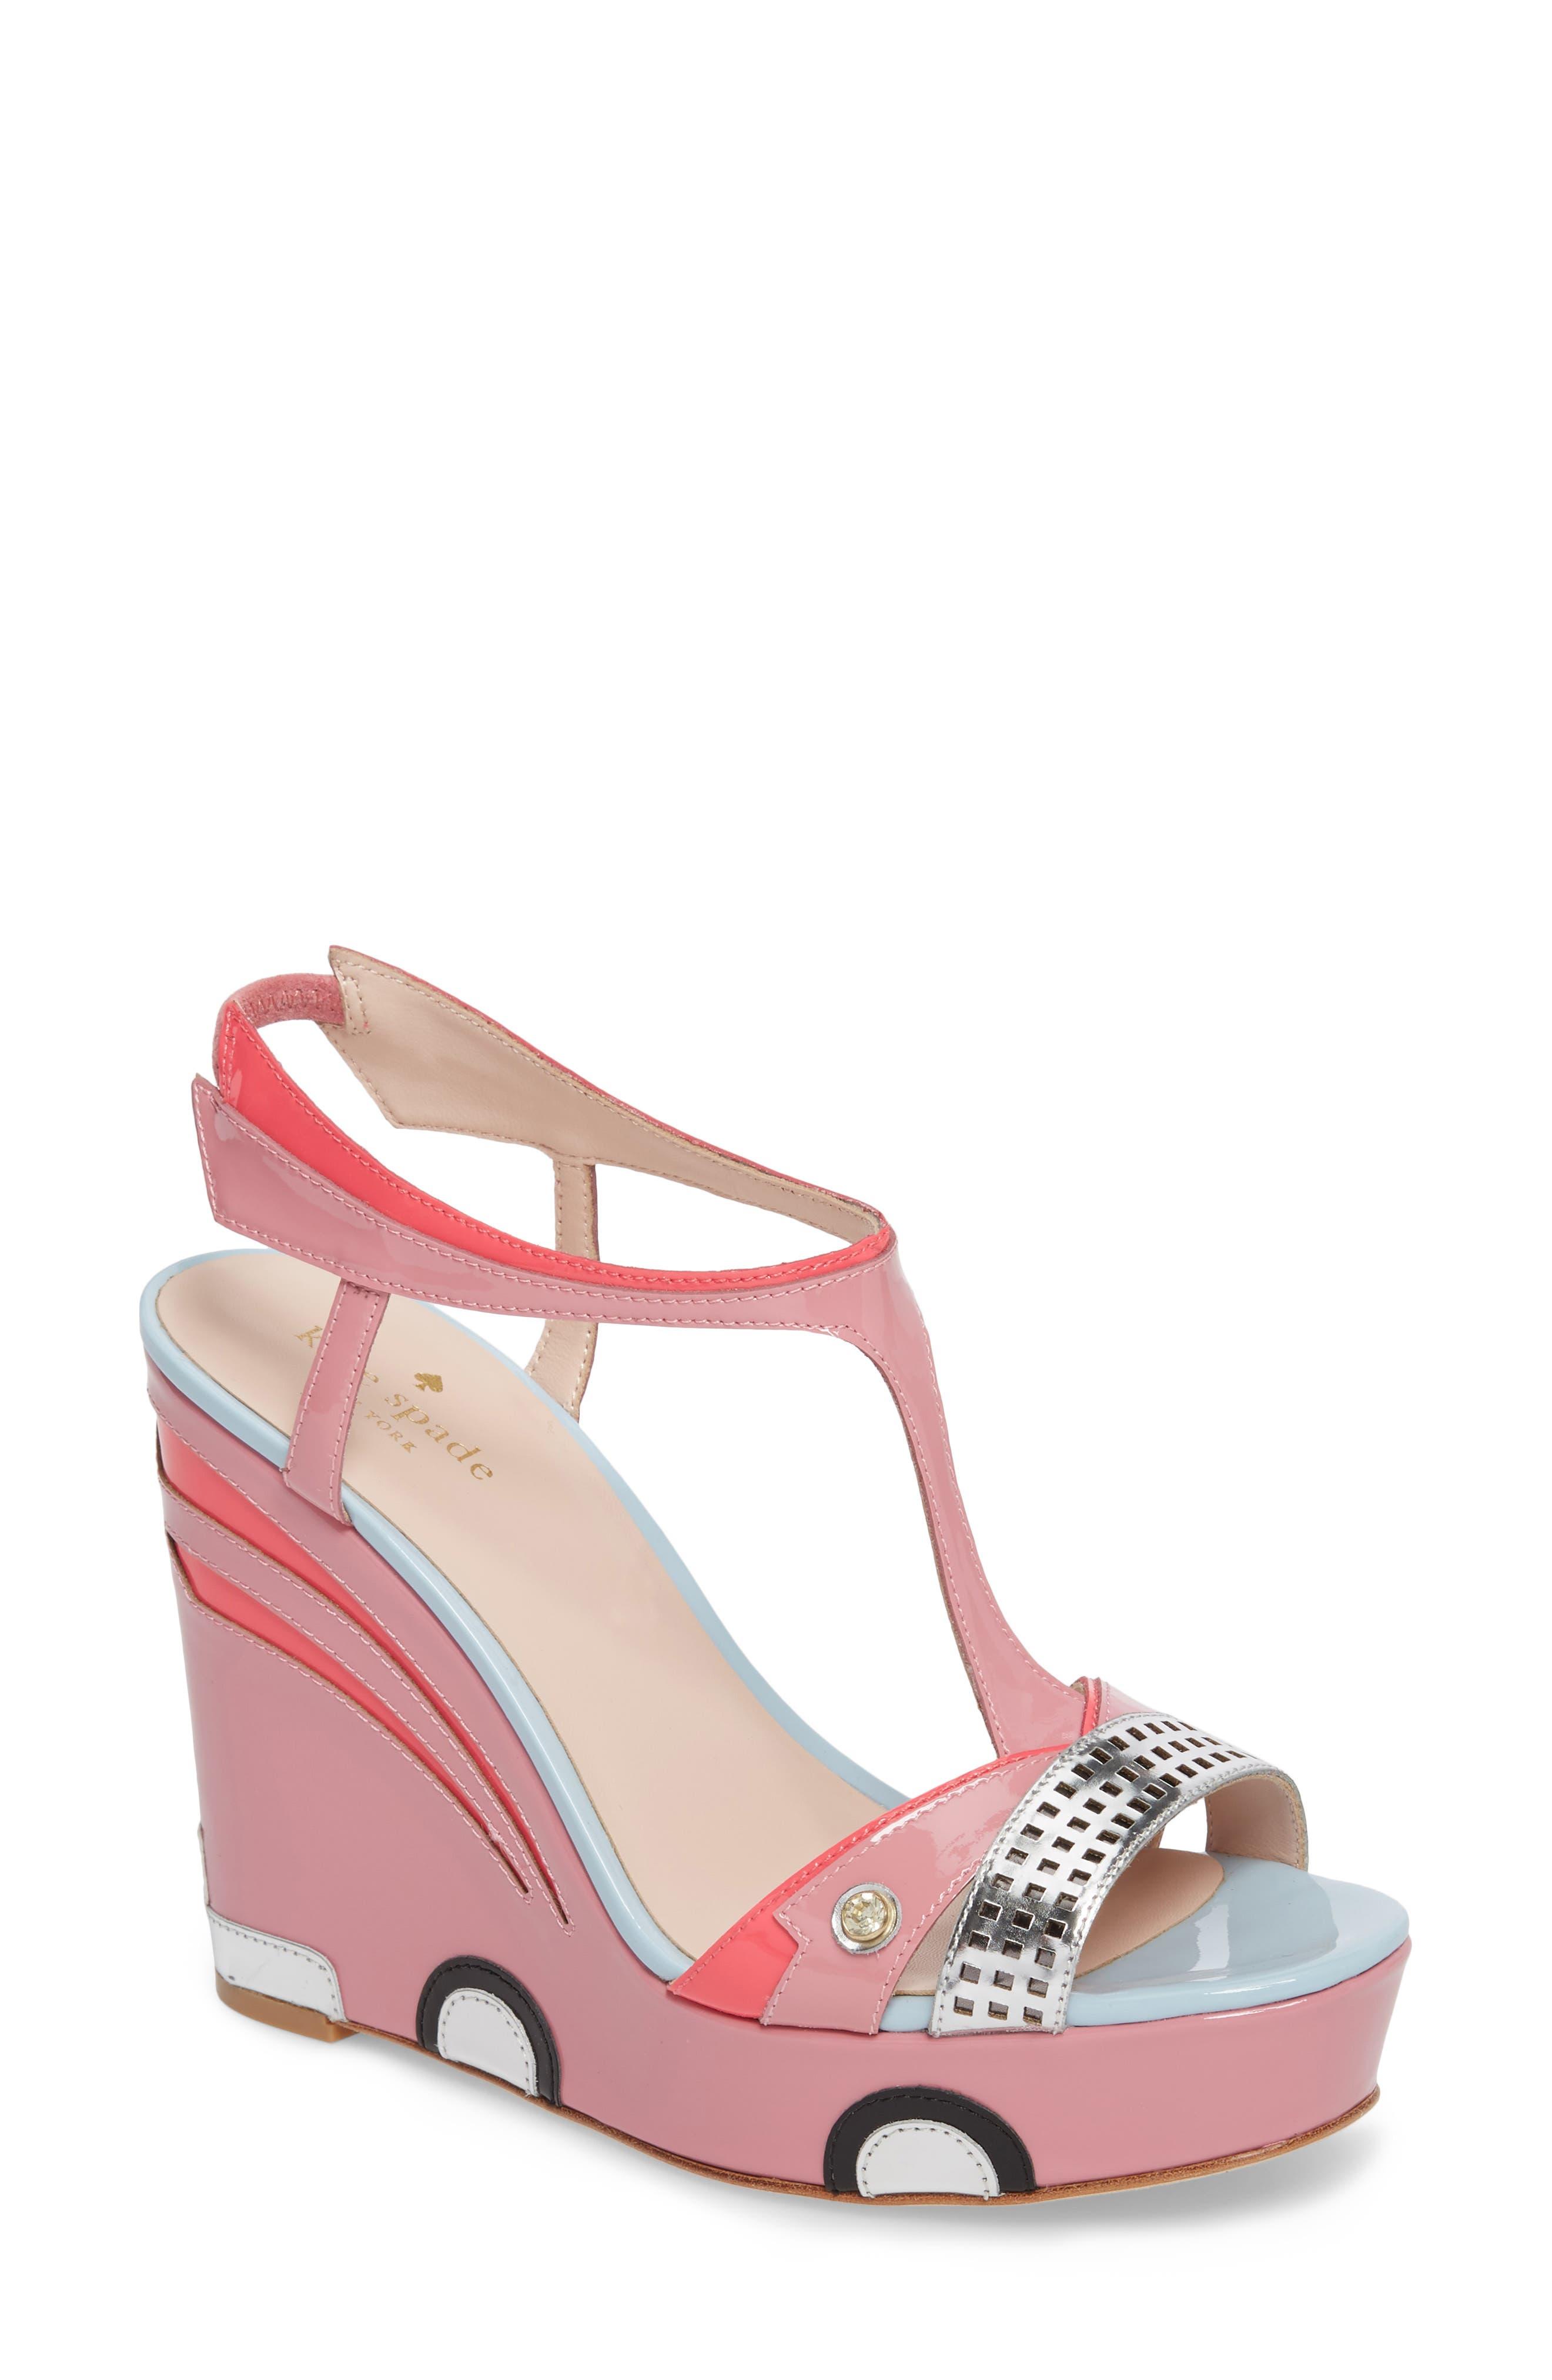 deanna wedge t-strap sandal,                             Main thumbnail 1, color,                             Petunia Patent